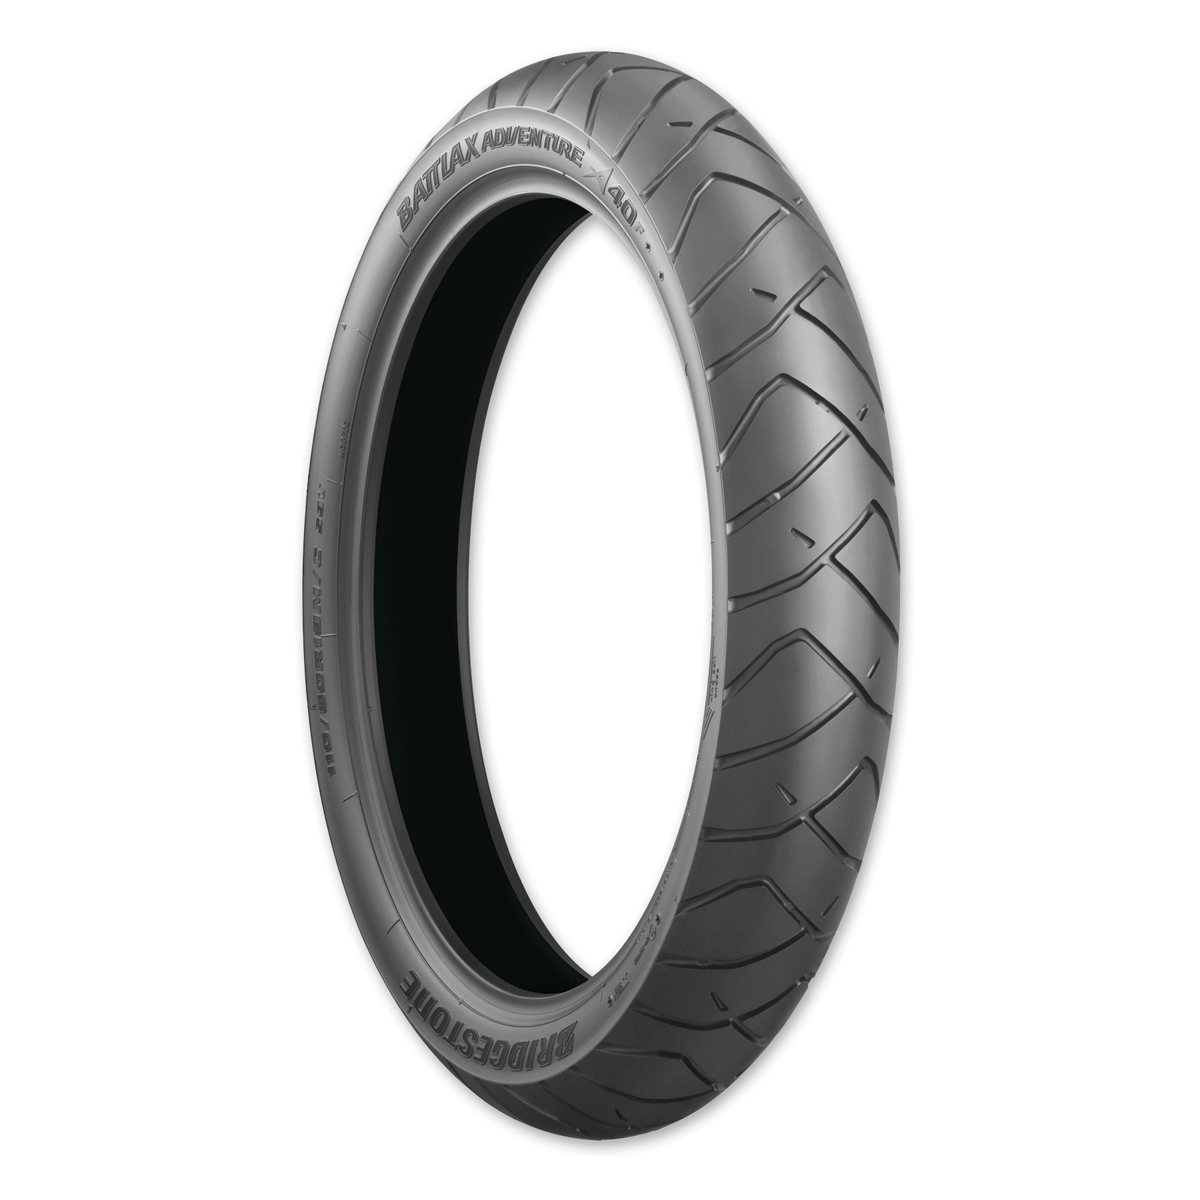 Bridgestone A40 120/70R19 Front Tire